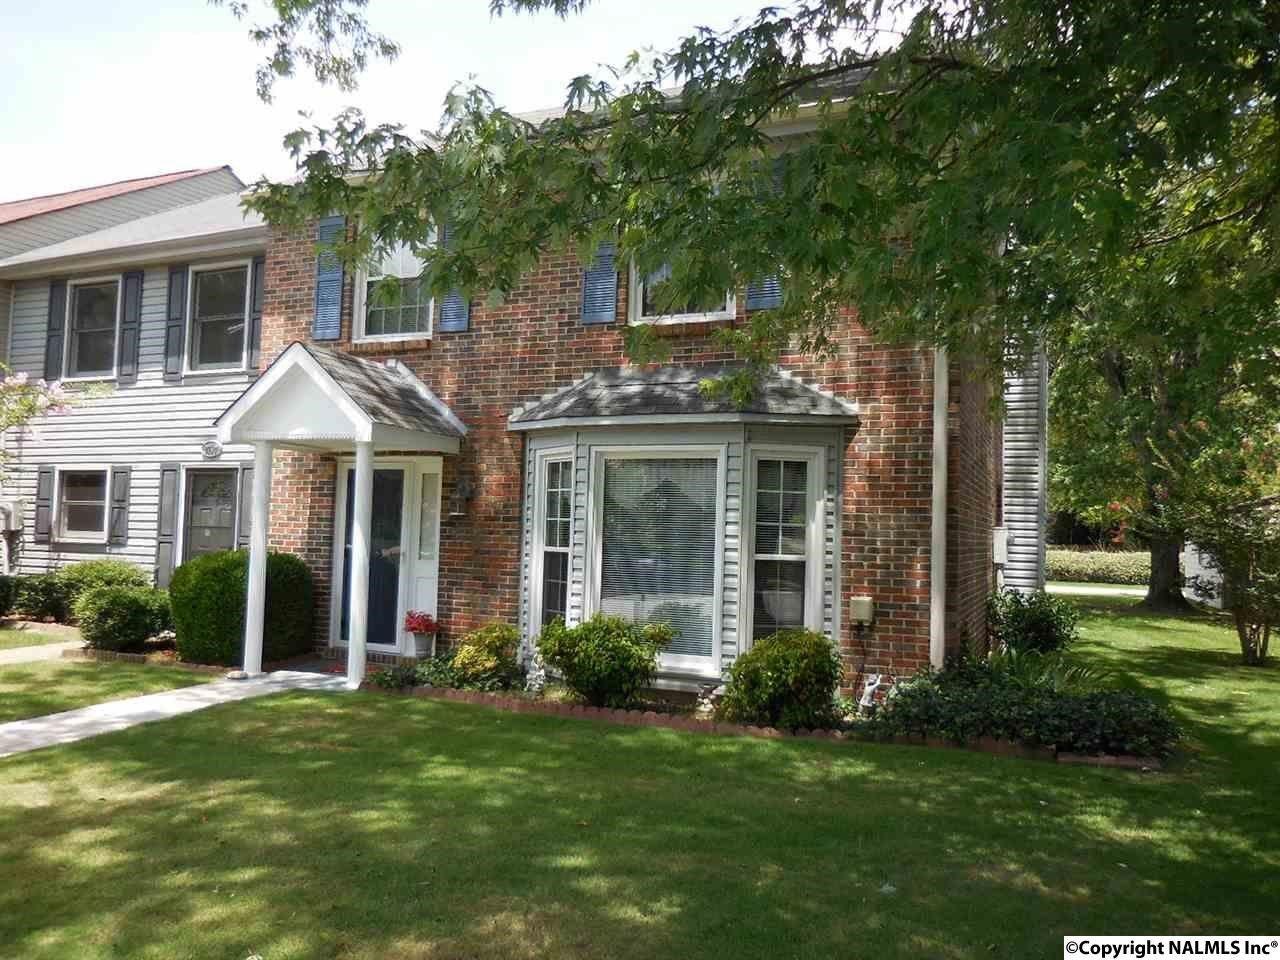 5cd4bc9160eb7b3364a7482733941550 - Better Homes And Gardens Huntsville Al